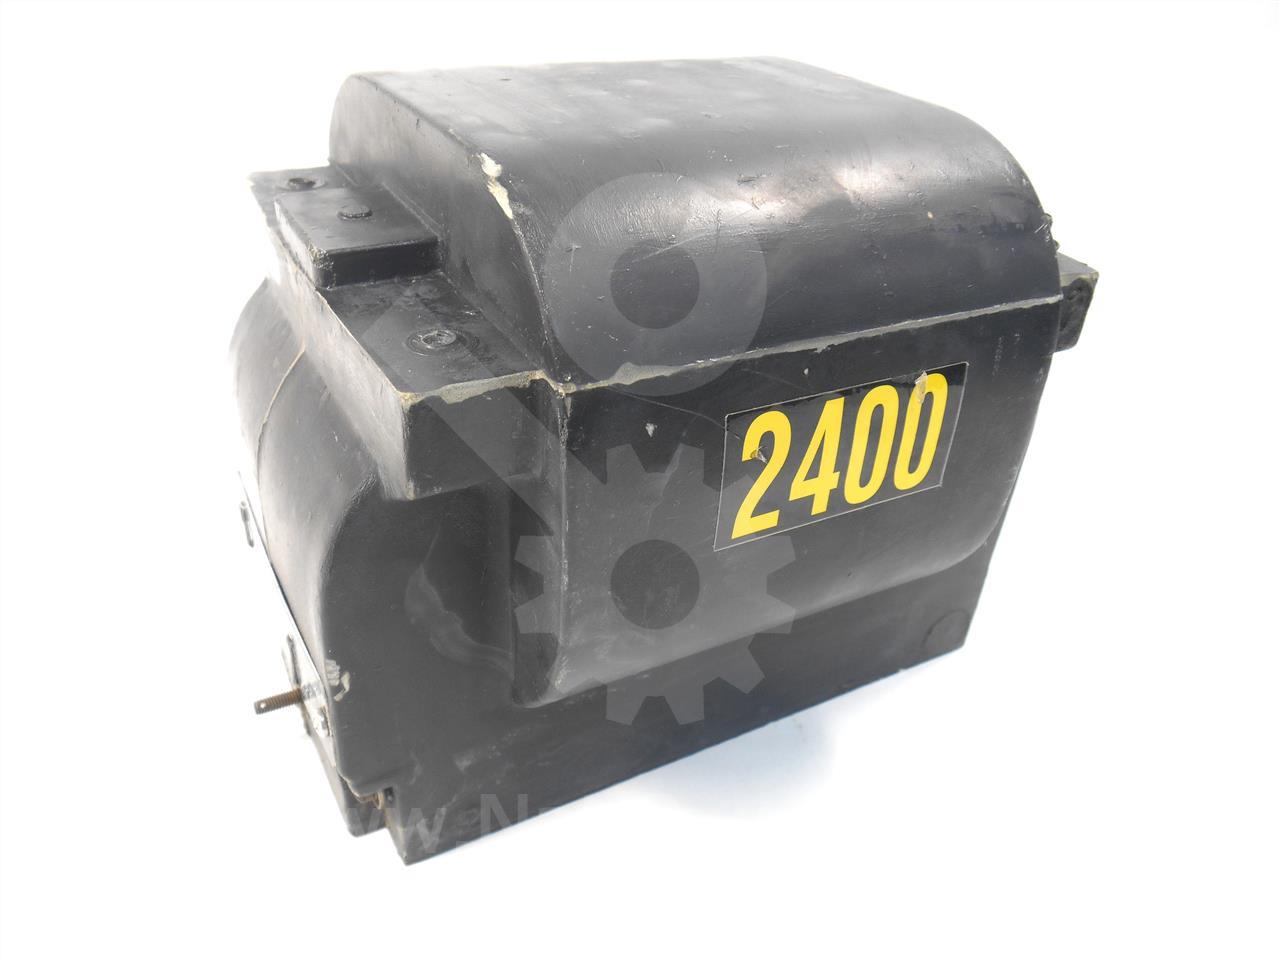 7525A50G01 ABB 20:1 VIY-60 POTENTIAL TRNSFORMER 5KV, 60KV BIL, 2400:120